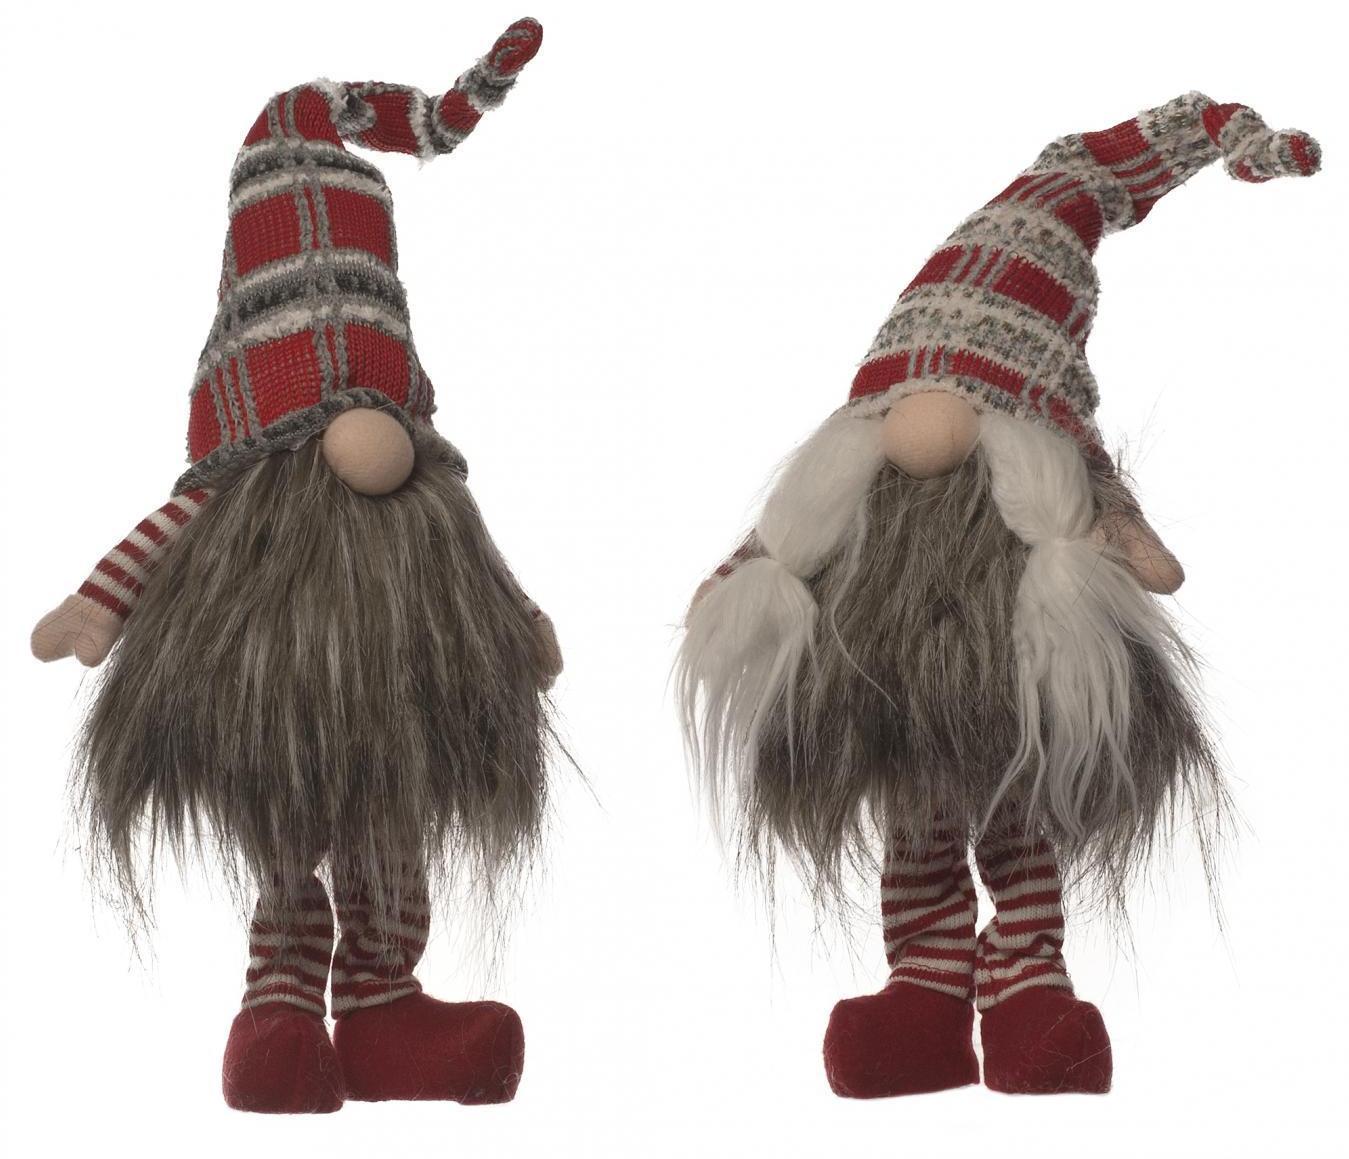 46cm 2 Assorted Tartan Hat Fur standing Gonks – Now Only £12.00